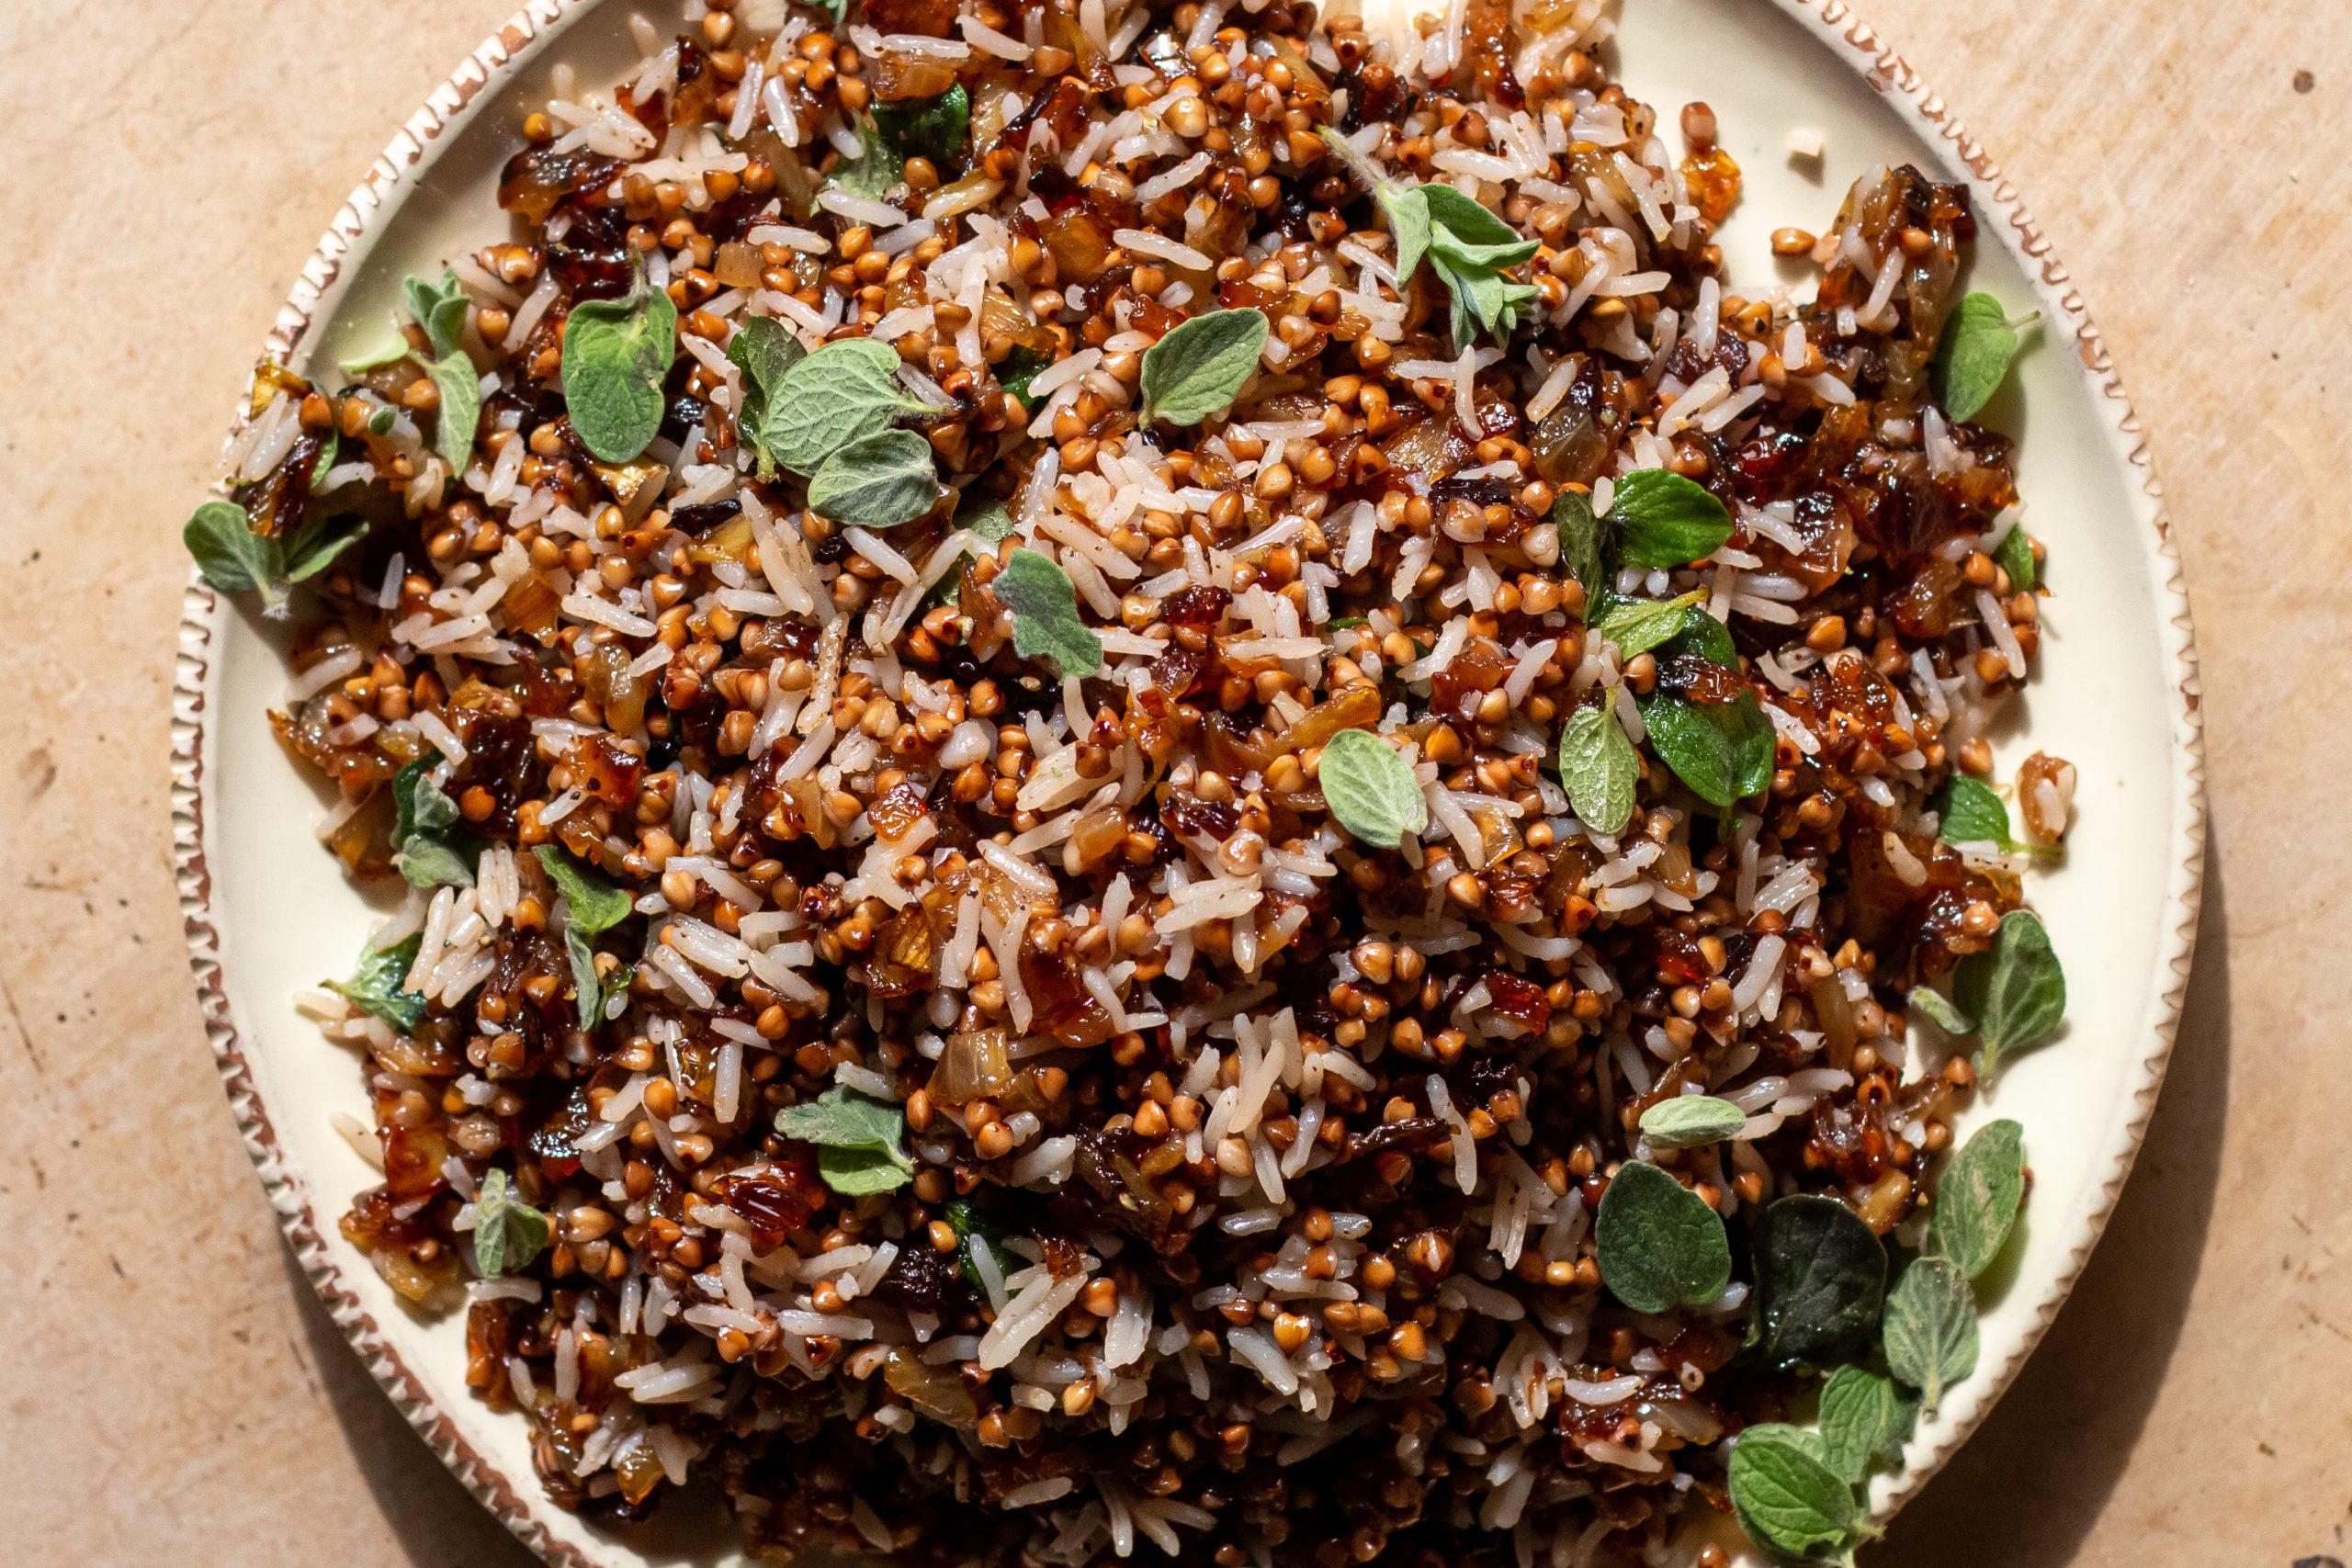 Buckwheat and za'atar mujadara on a ceramic plate